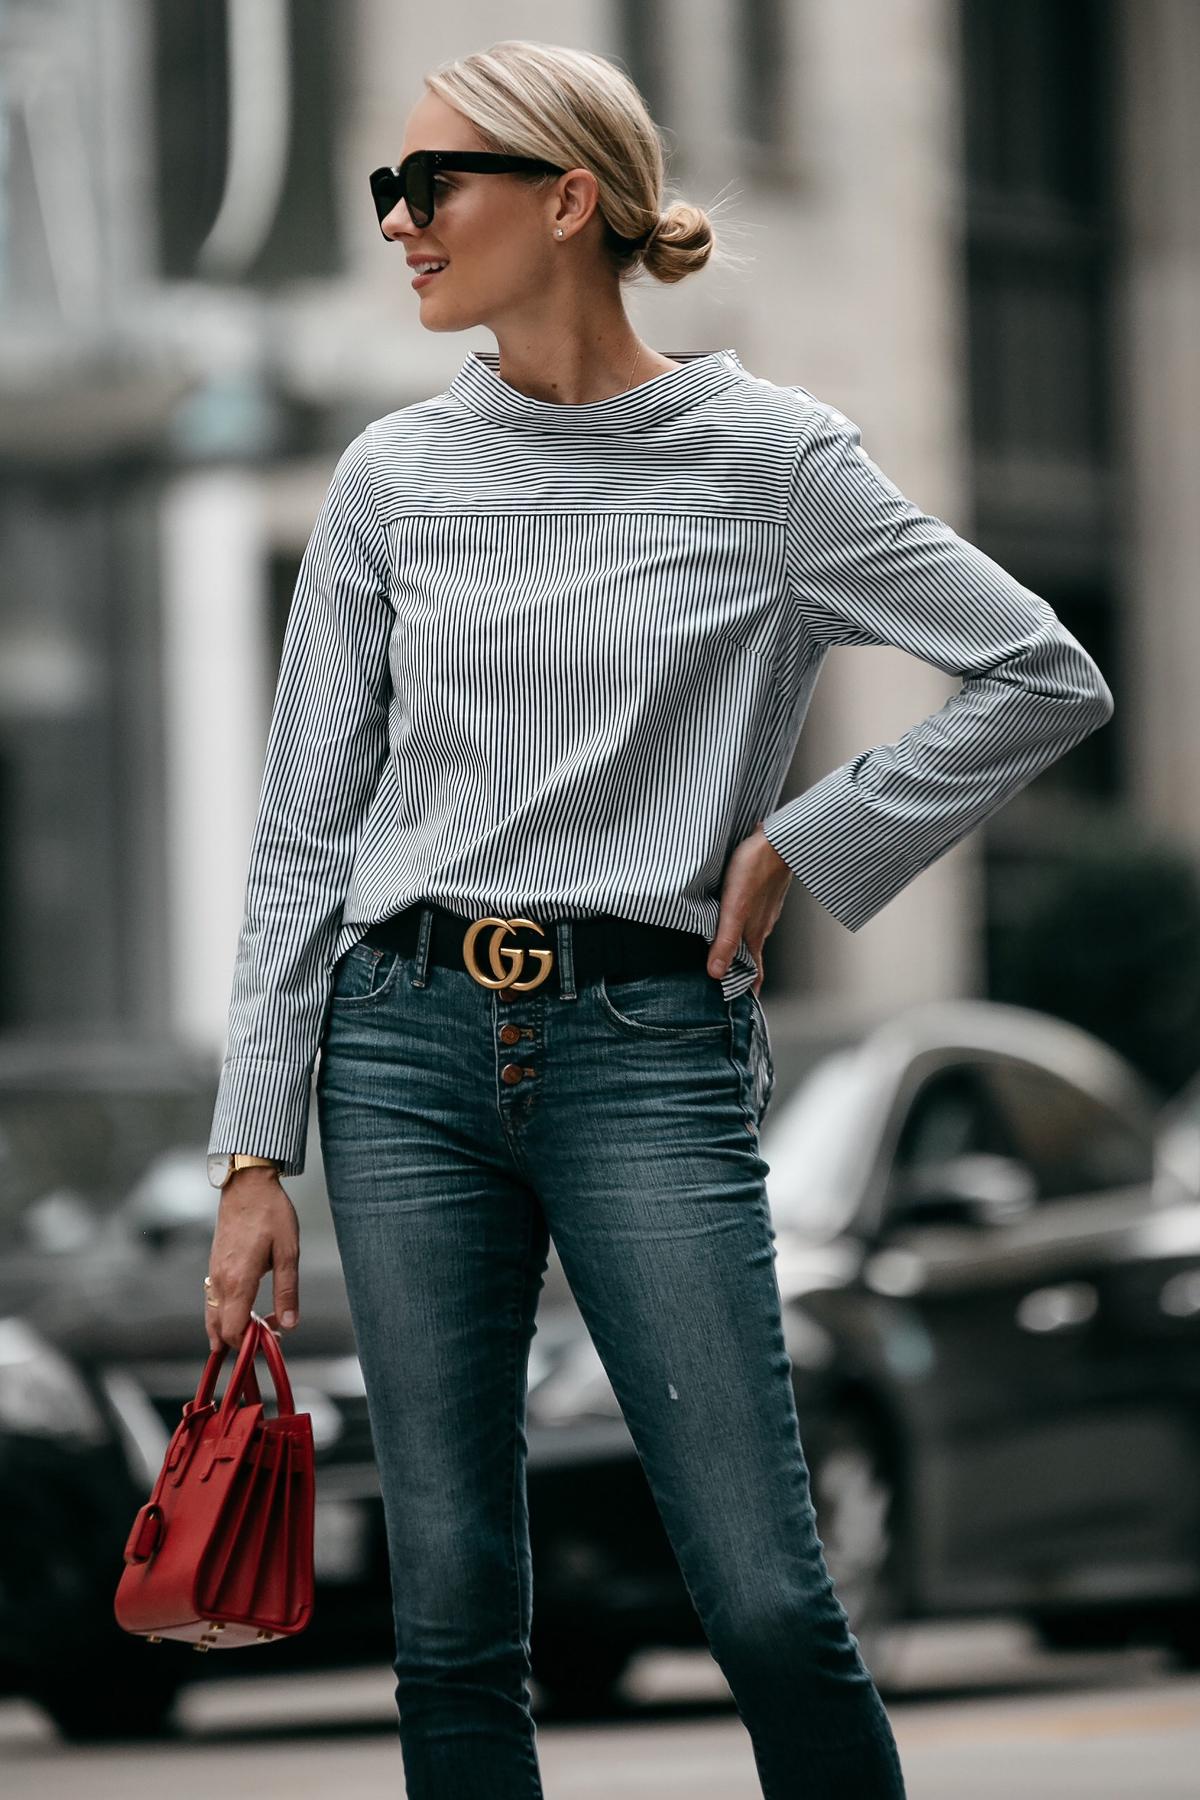 Blonde Woman Wearing Jcrew Grey Striped Shirt Denim Skinny Jeans Gucci Belt Saint Laurent Sac De Jour Mini Red Fashion Jackson Dallas Blogger Fashion Blogger Street Style